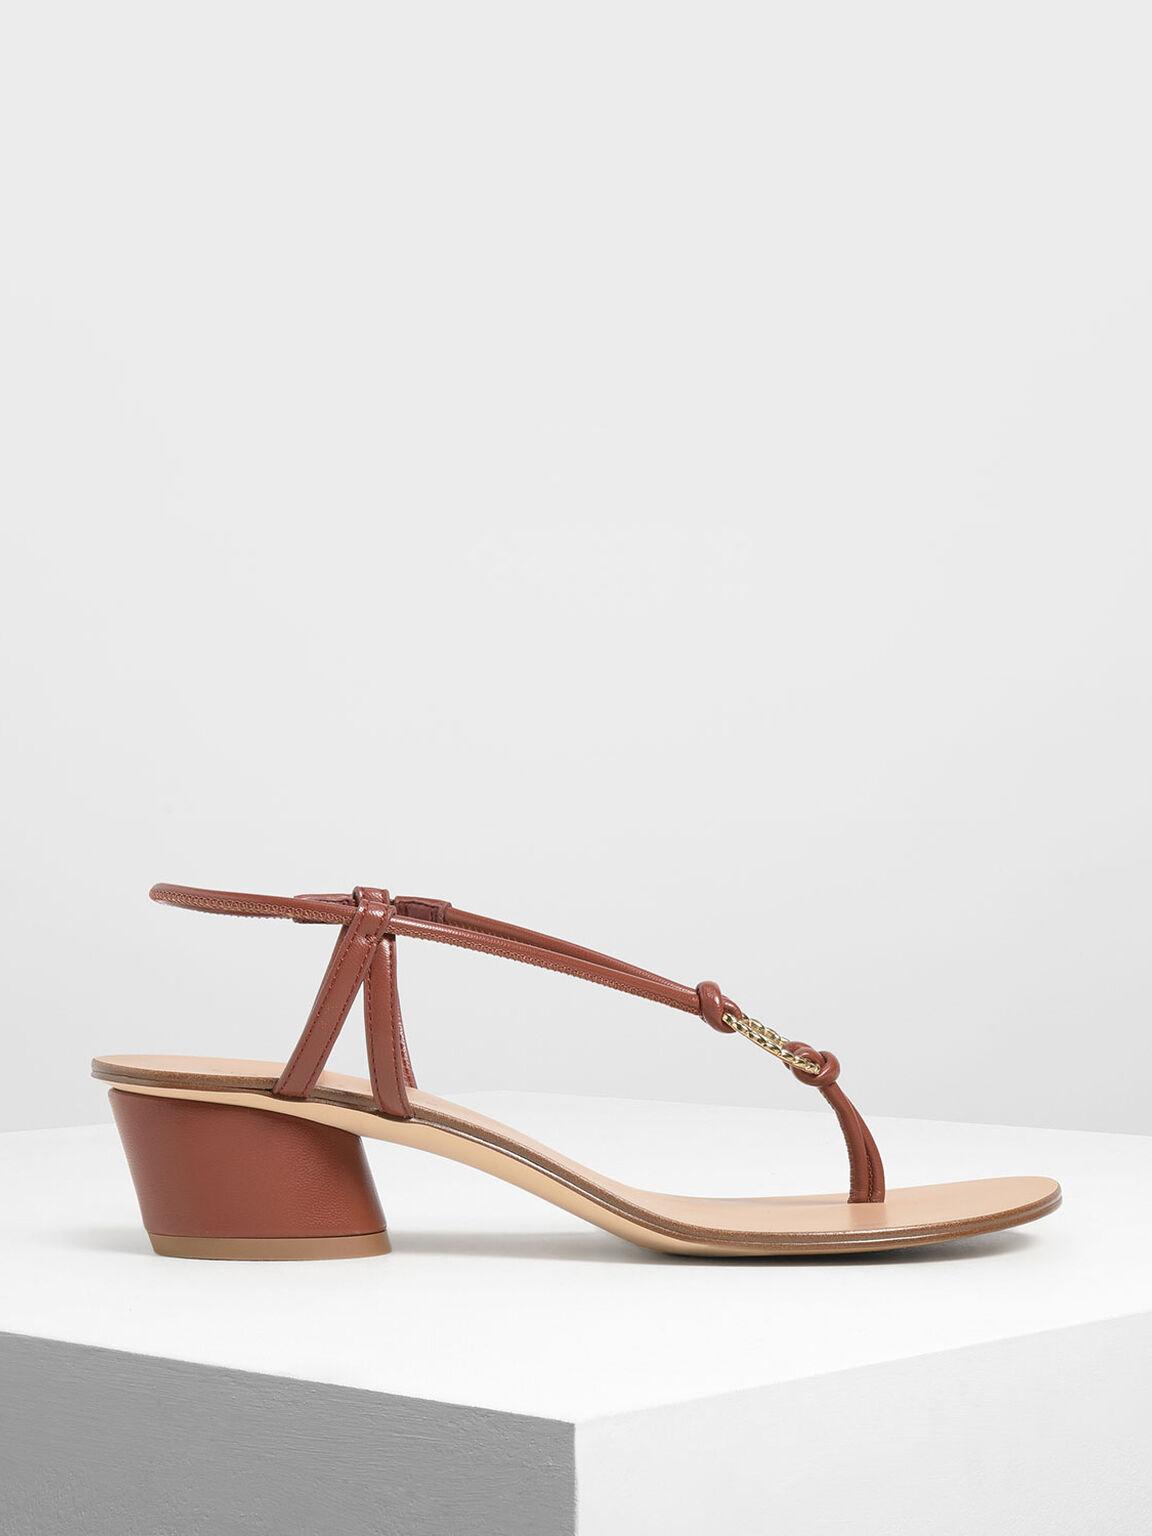 Gold Detail Block Heel Sandals, Dark Brown, hi-res